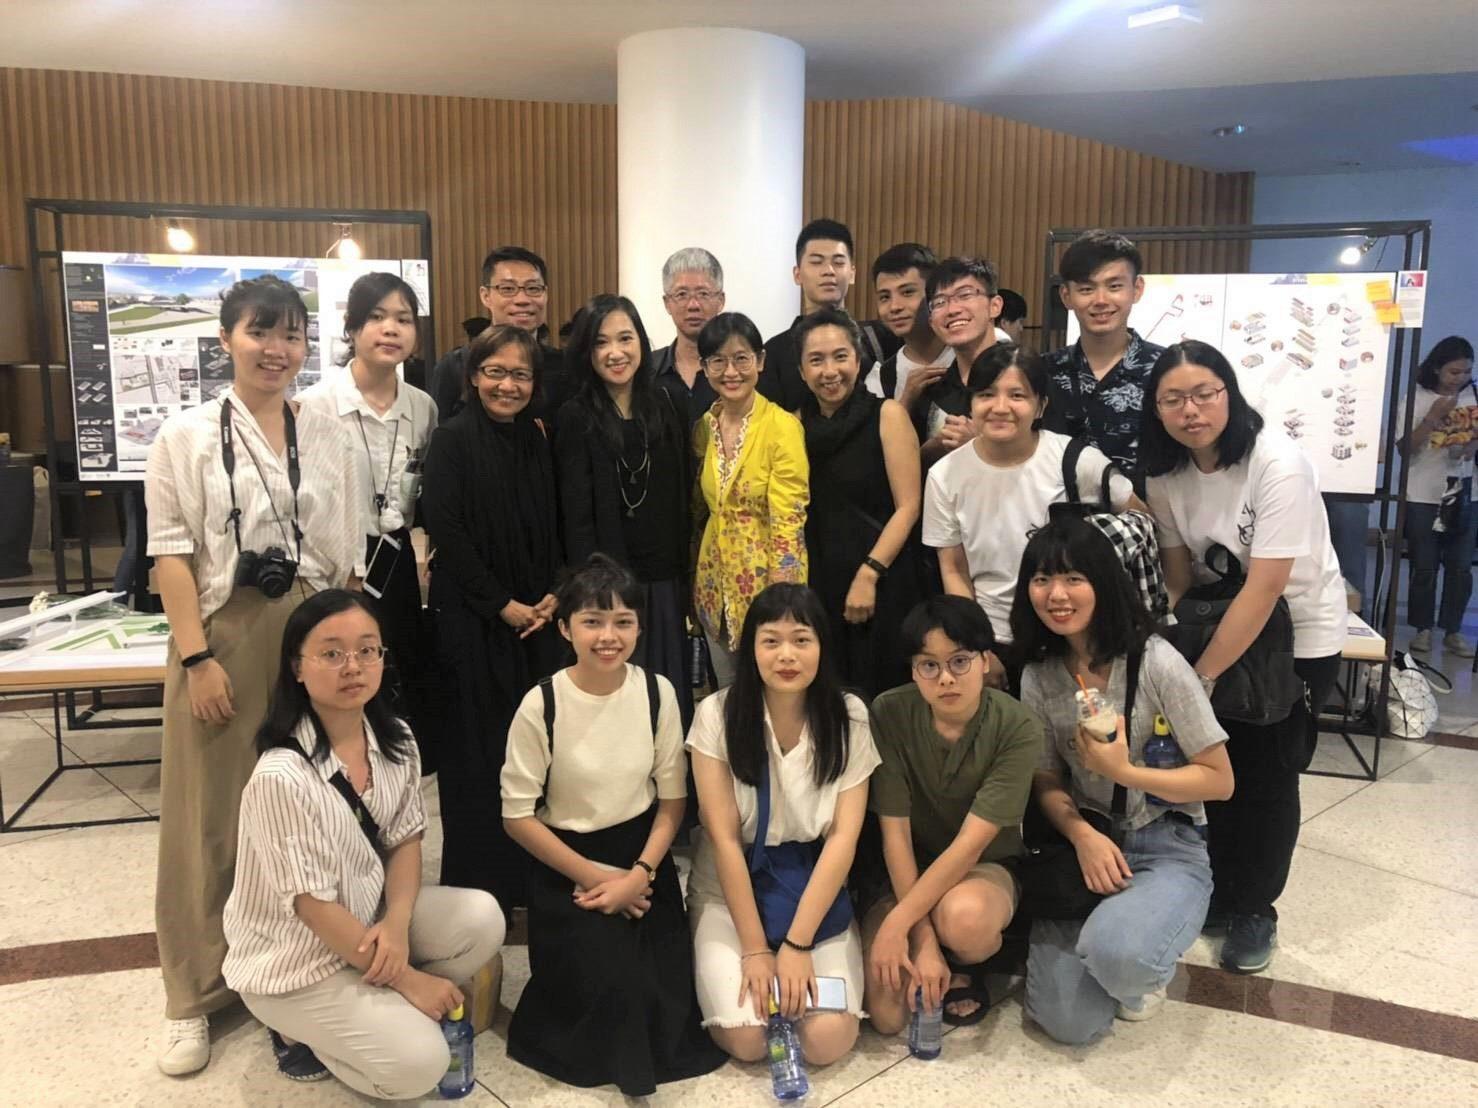 "SoA+D ต้อนรับคณาจารย์และนักศึกษาจาก Ming Chuan University เยี่ยมชมนิทรรศการแสดงผลงานวิทยานิพนธ์ ""เต็กสมัยนี้"" Architecture Thesis Show 2019 พร้อมร่วมหารือความร่วมมือด้าน Digital และ Creativity"